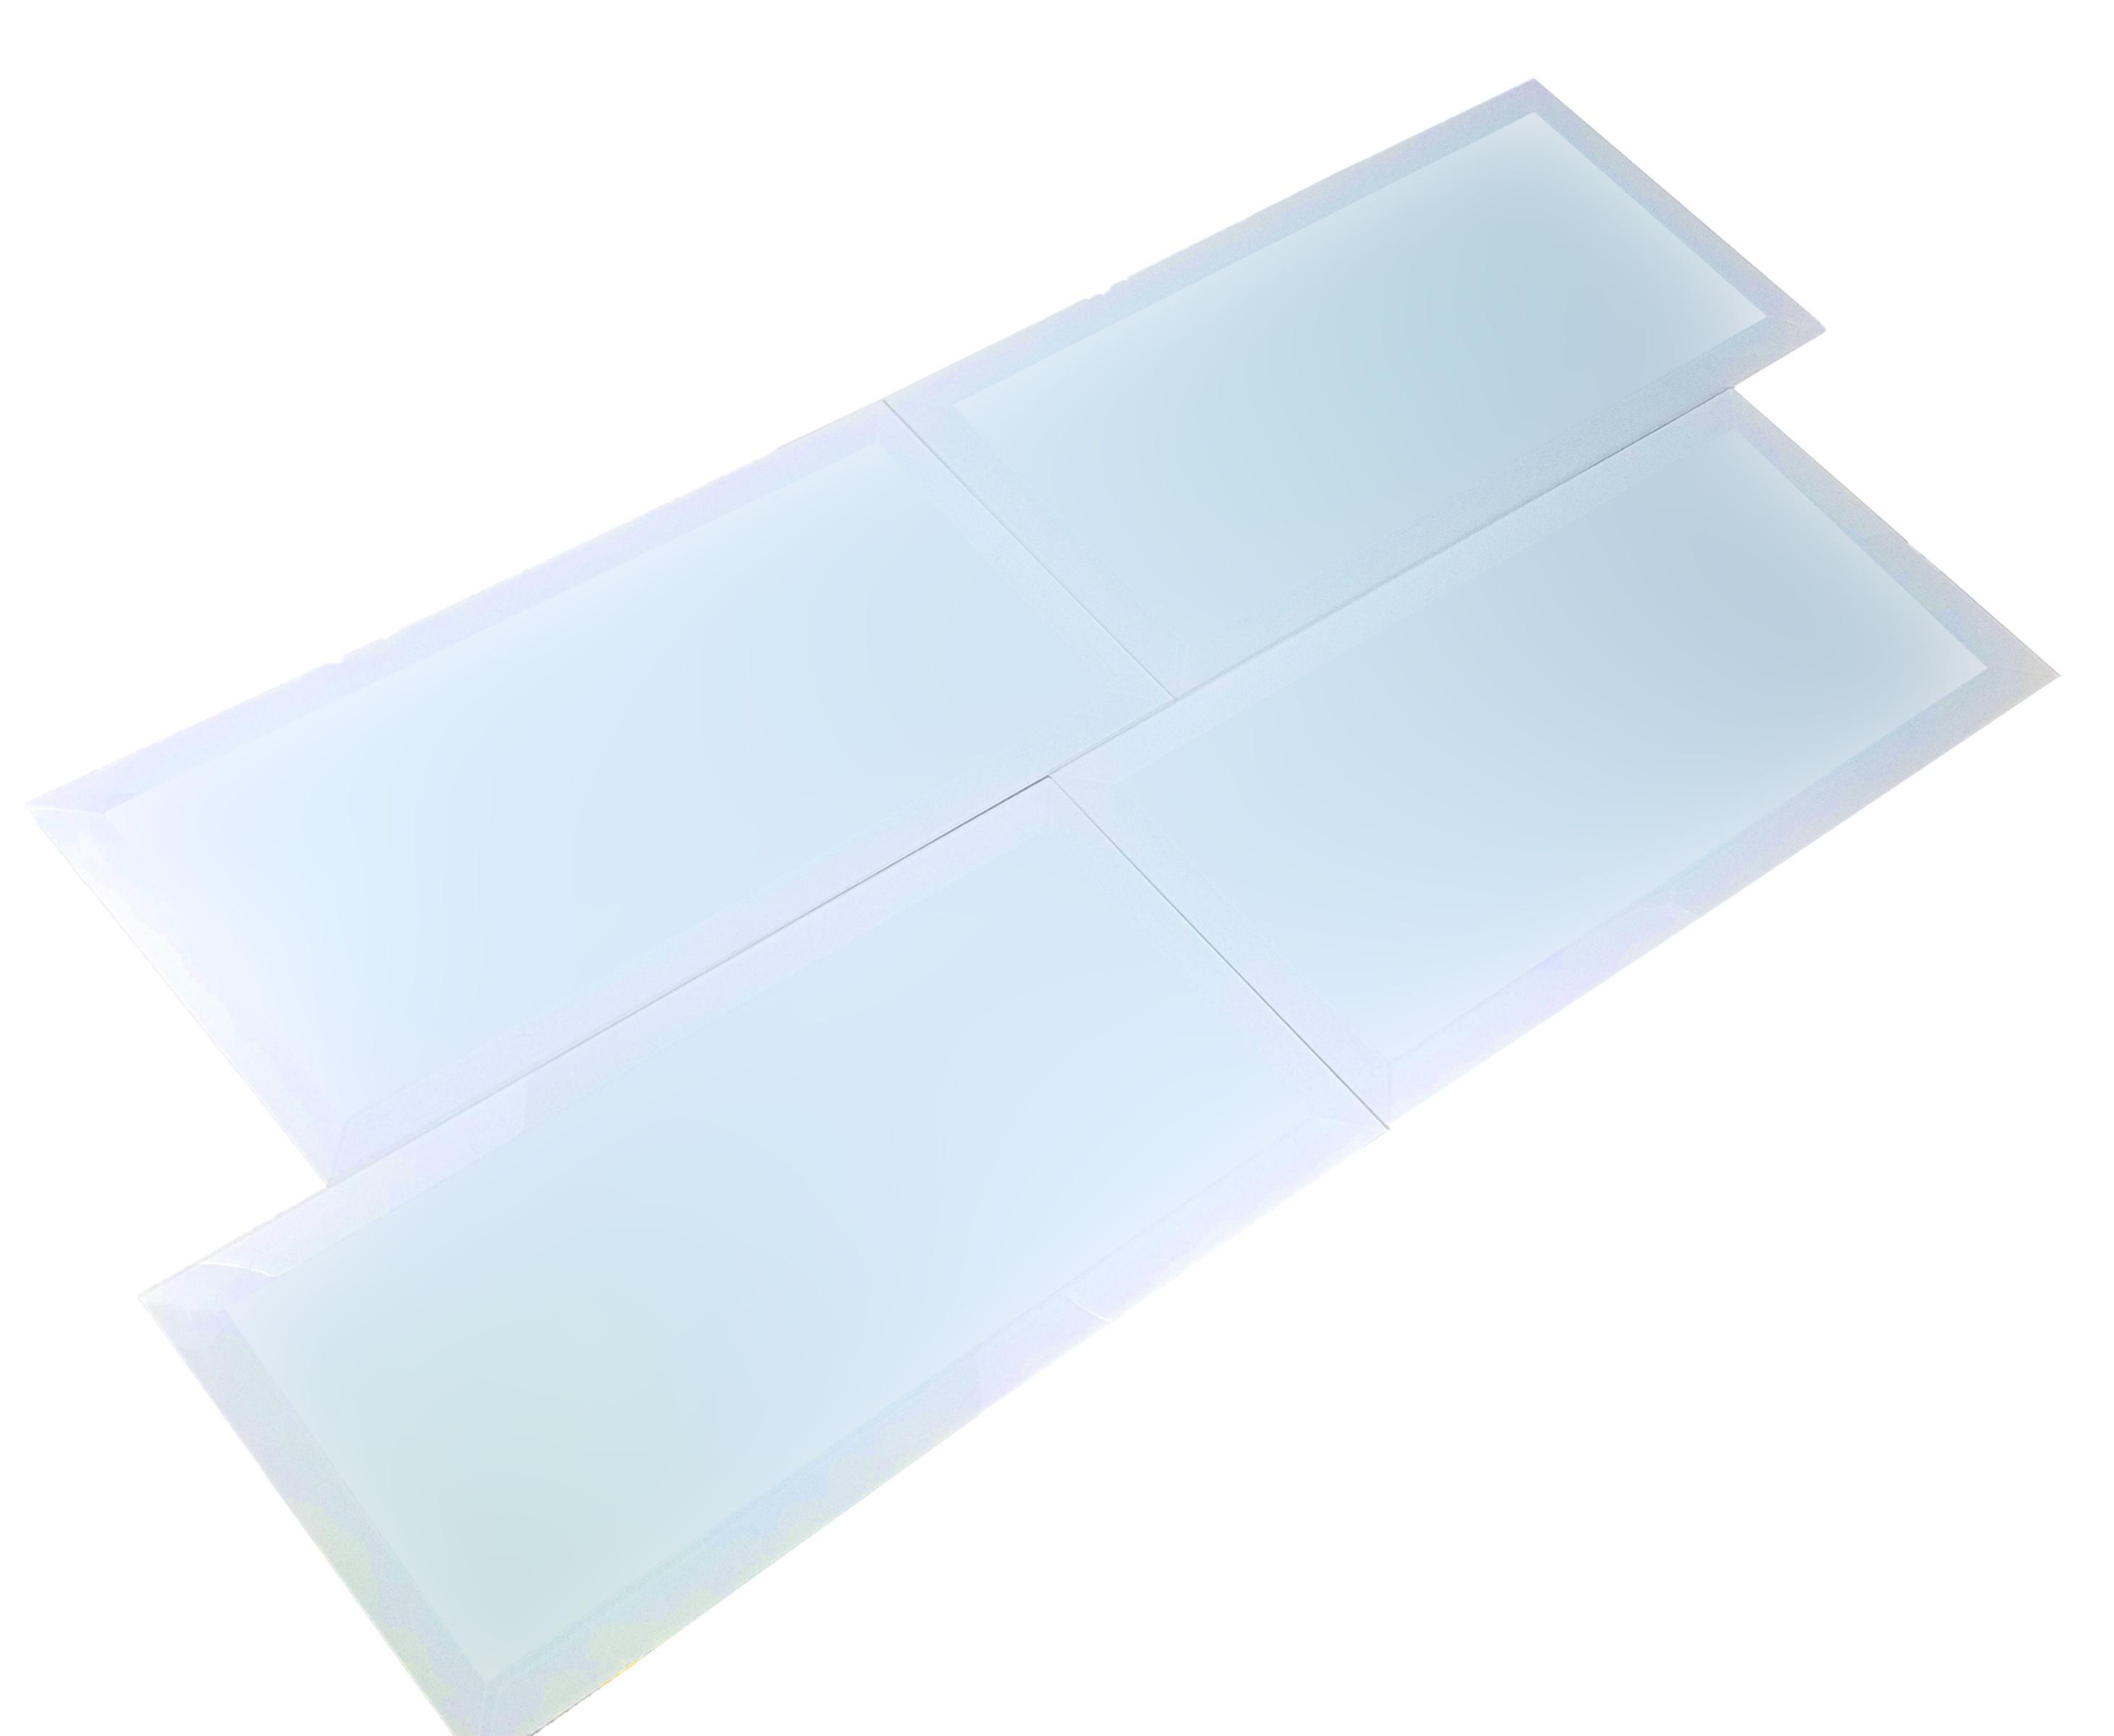 "Frosted Elegance 8"" x 16"" Matte Blue Glass Field Backsplash Wall Tile"